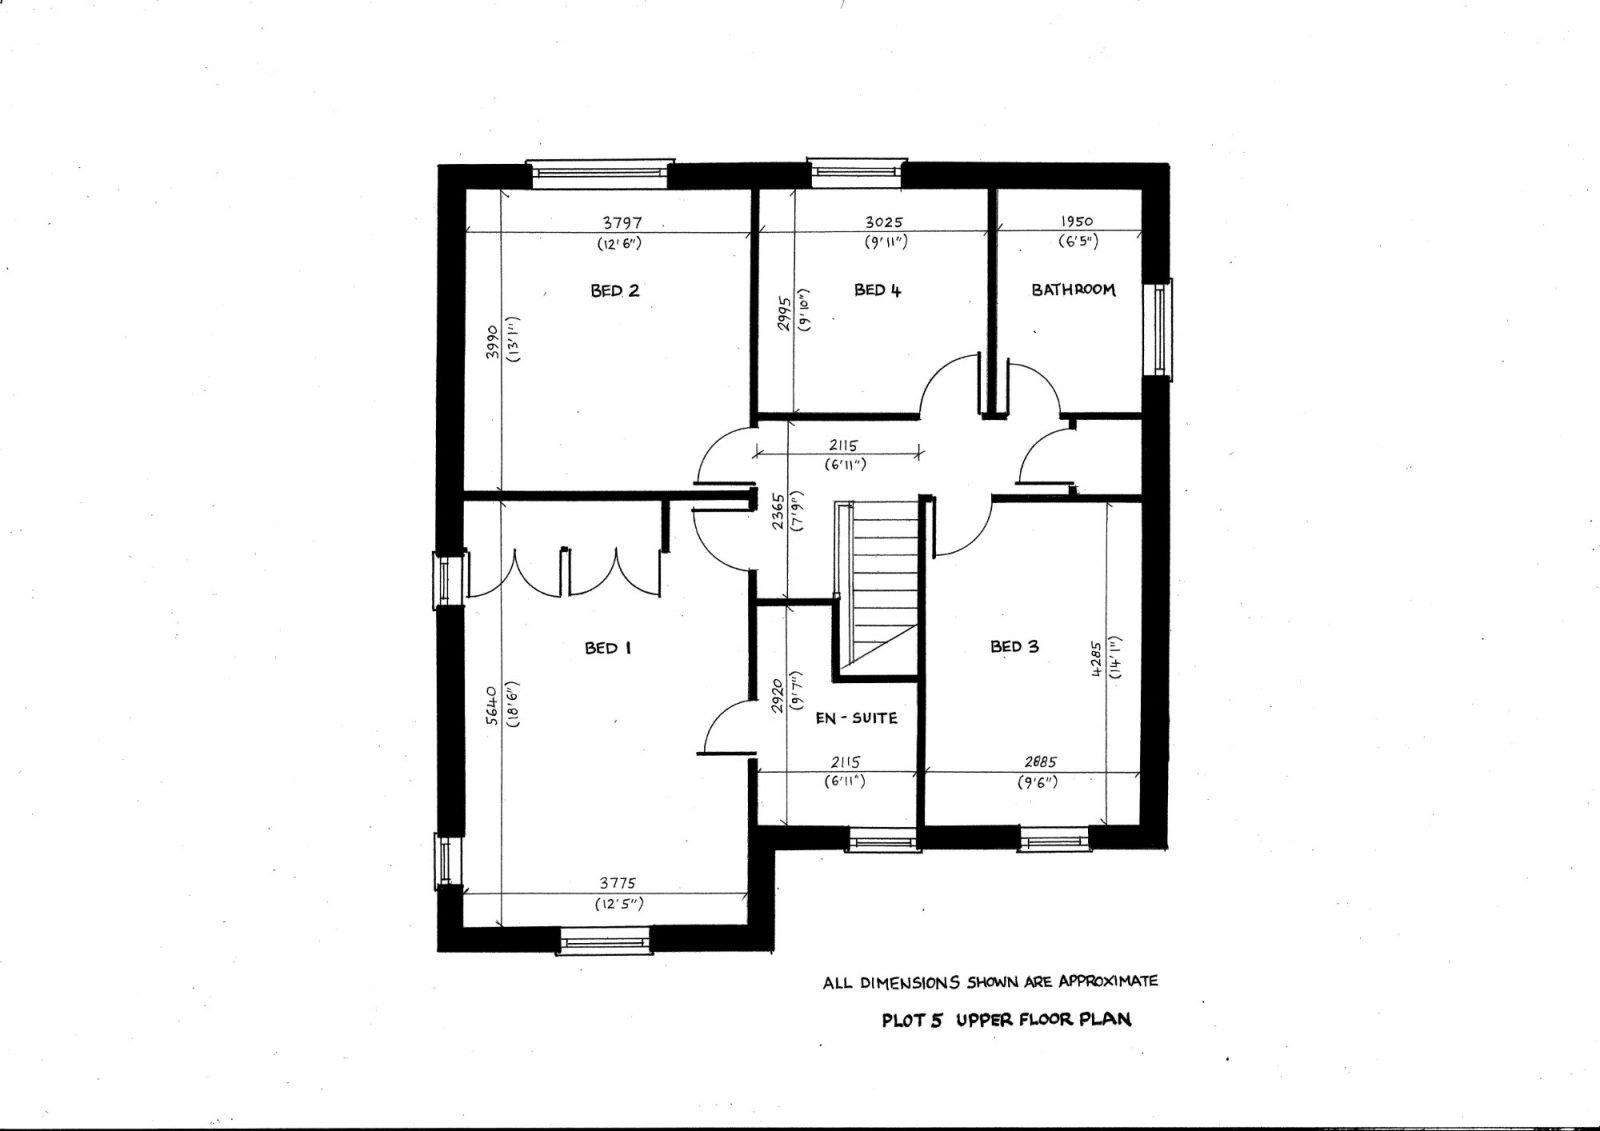 Plot 5 upper floor plan richard reed builders for Find plot plan online